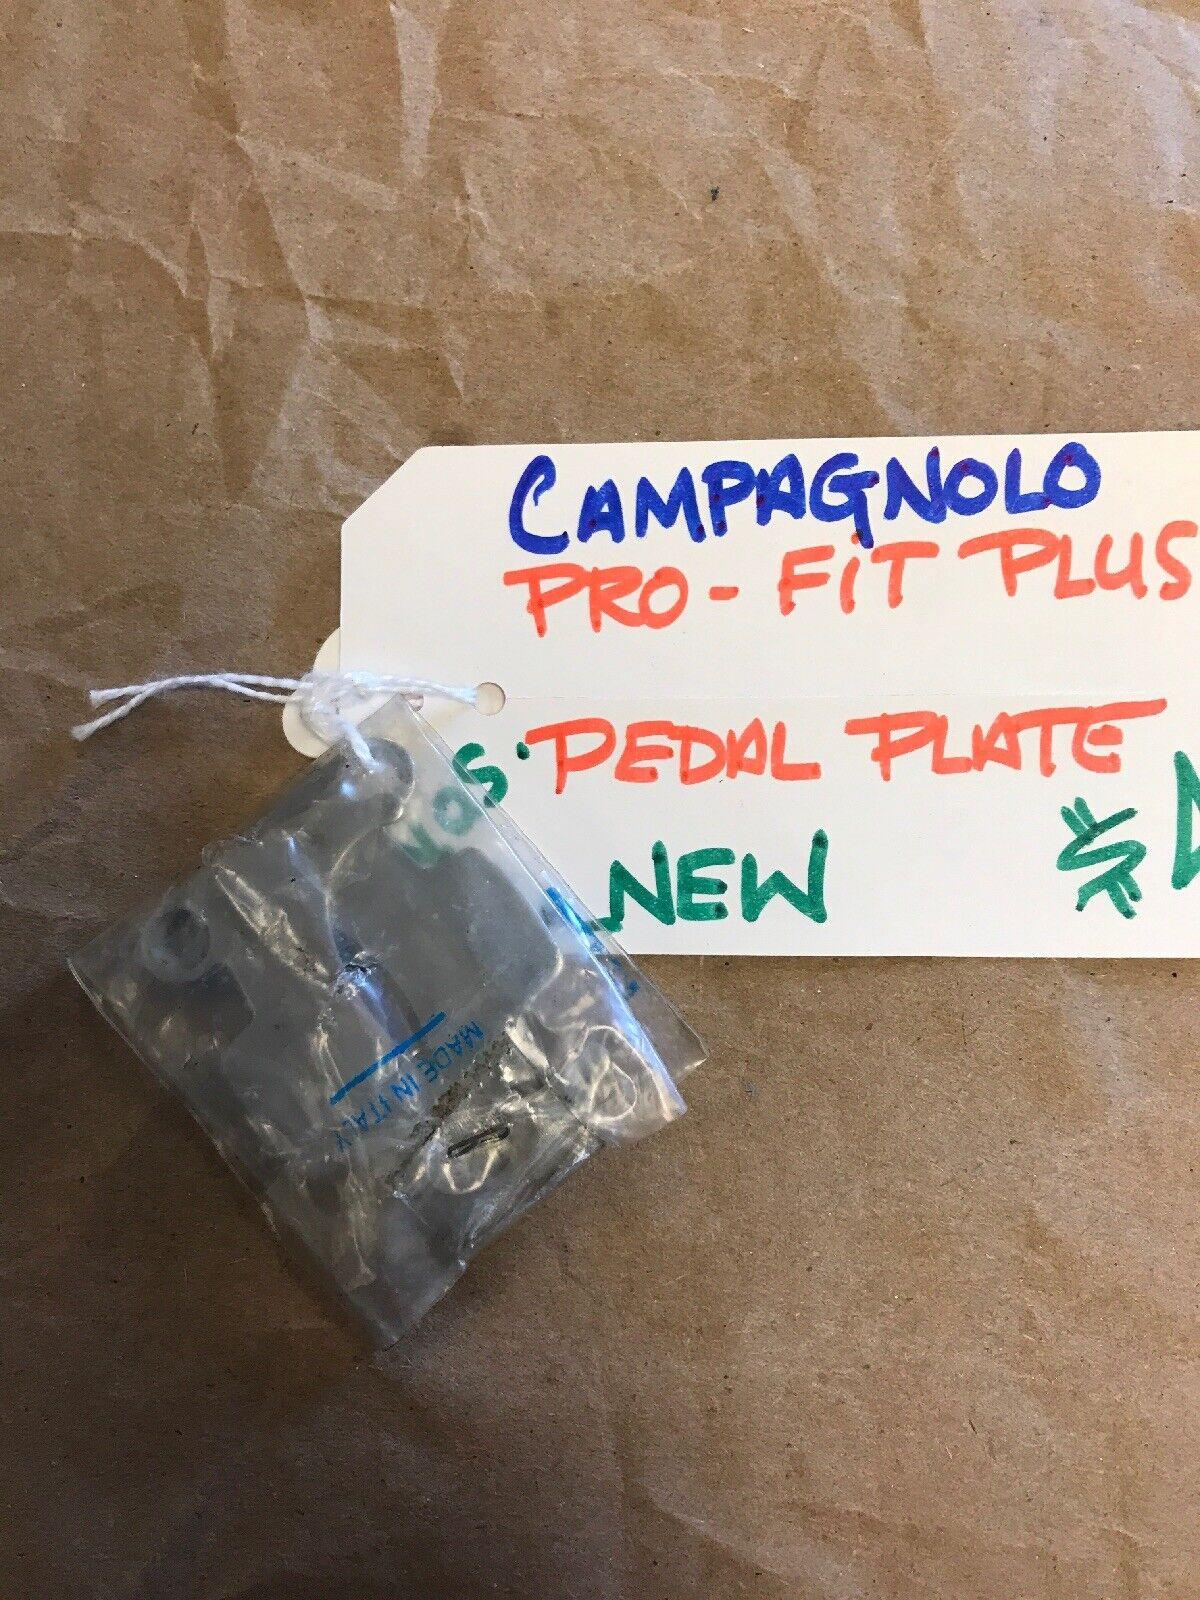 Campagnolo Pro-Fit Plus Pedal Plate